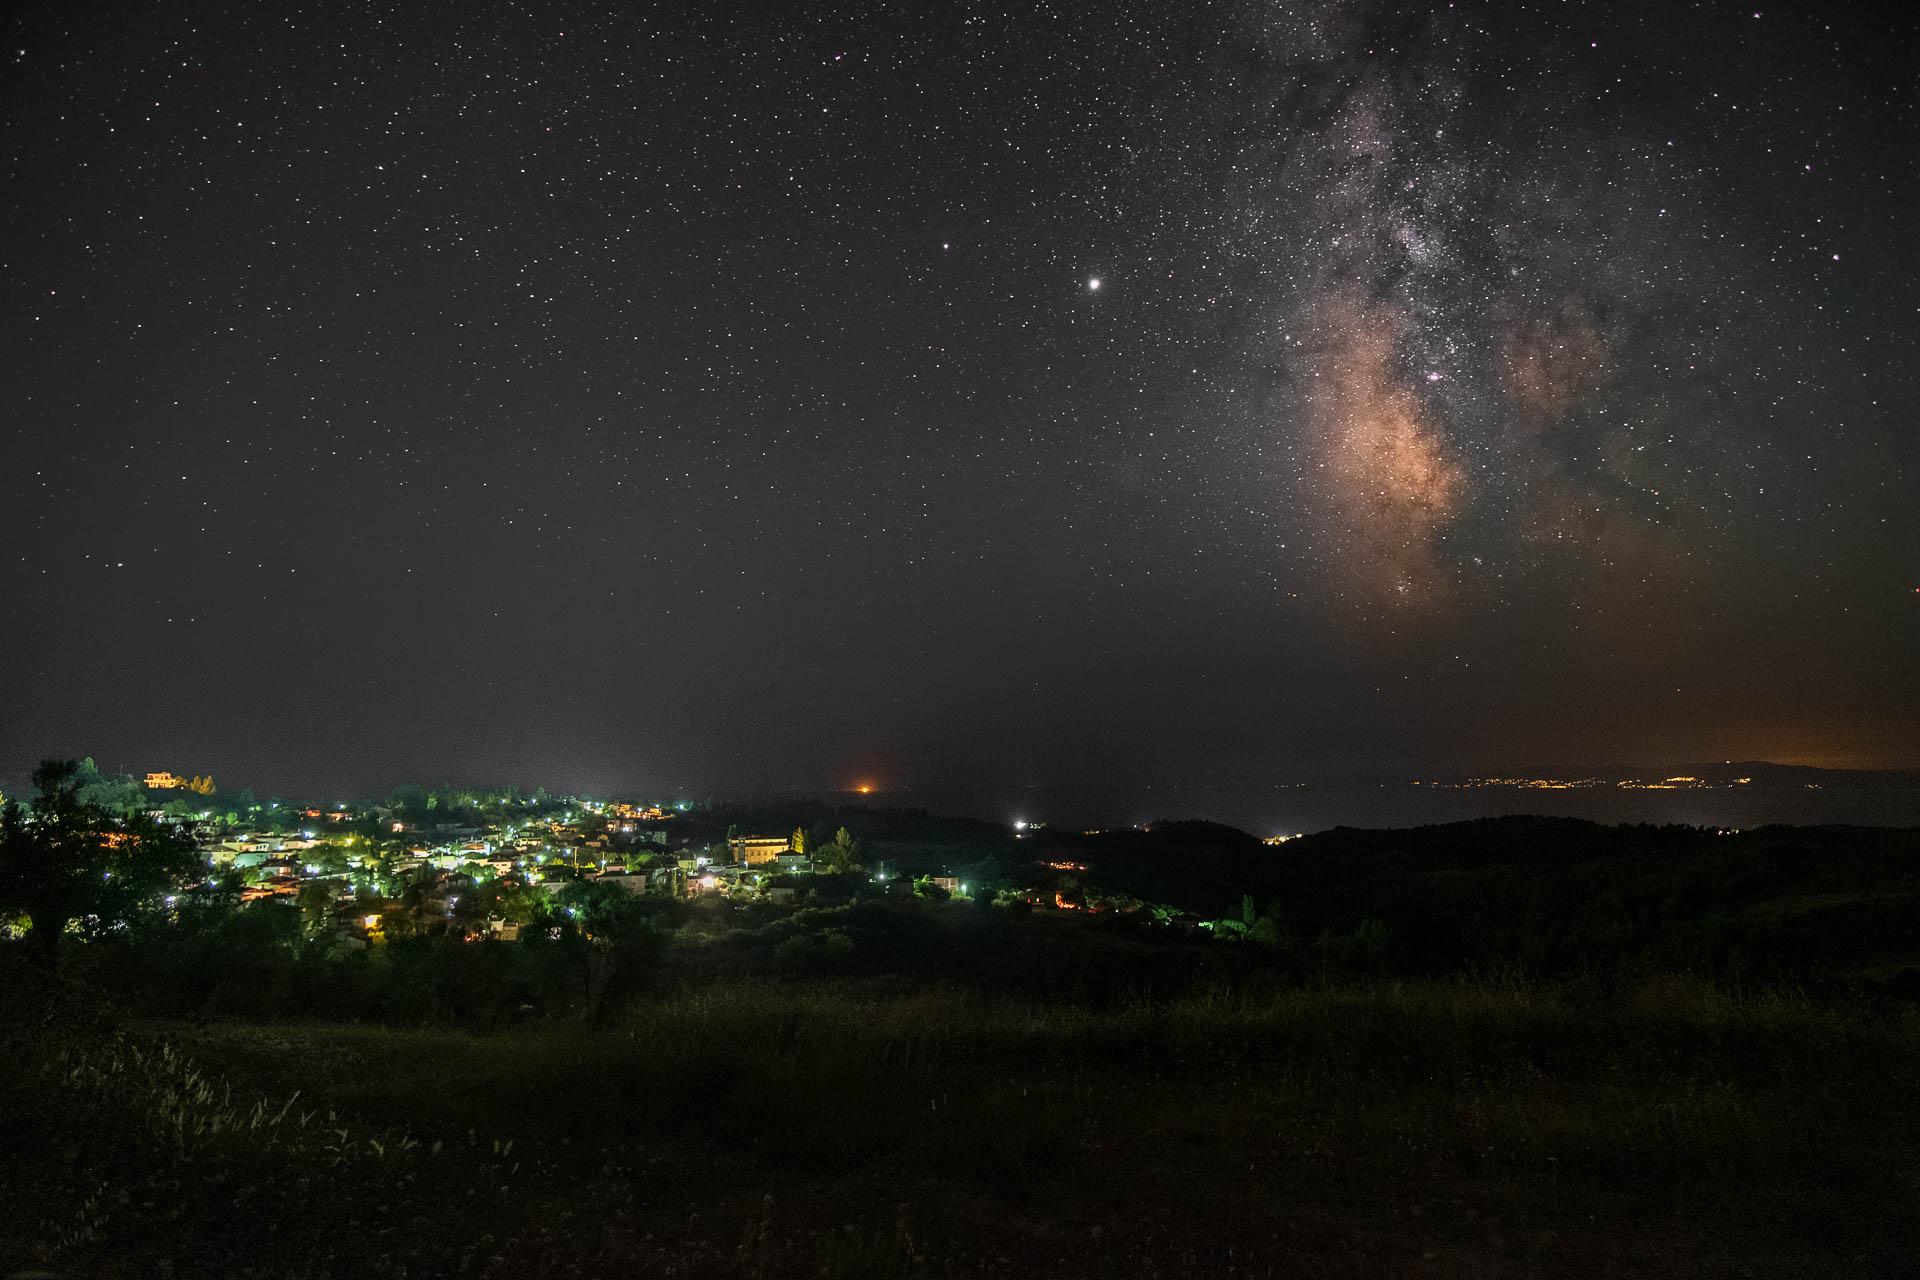 Milkyway over Agia Paraskevi in Chalkidiki